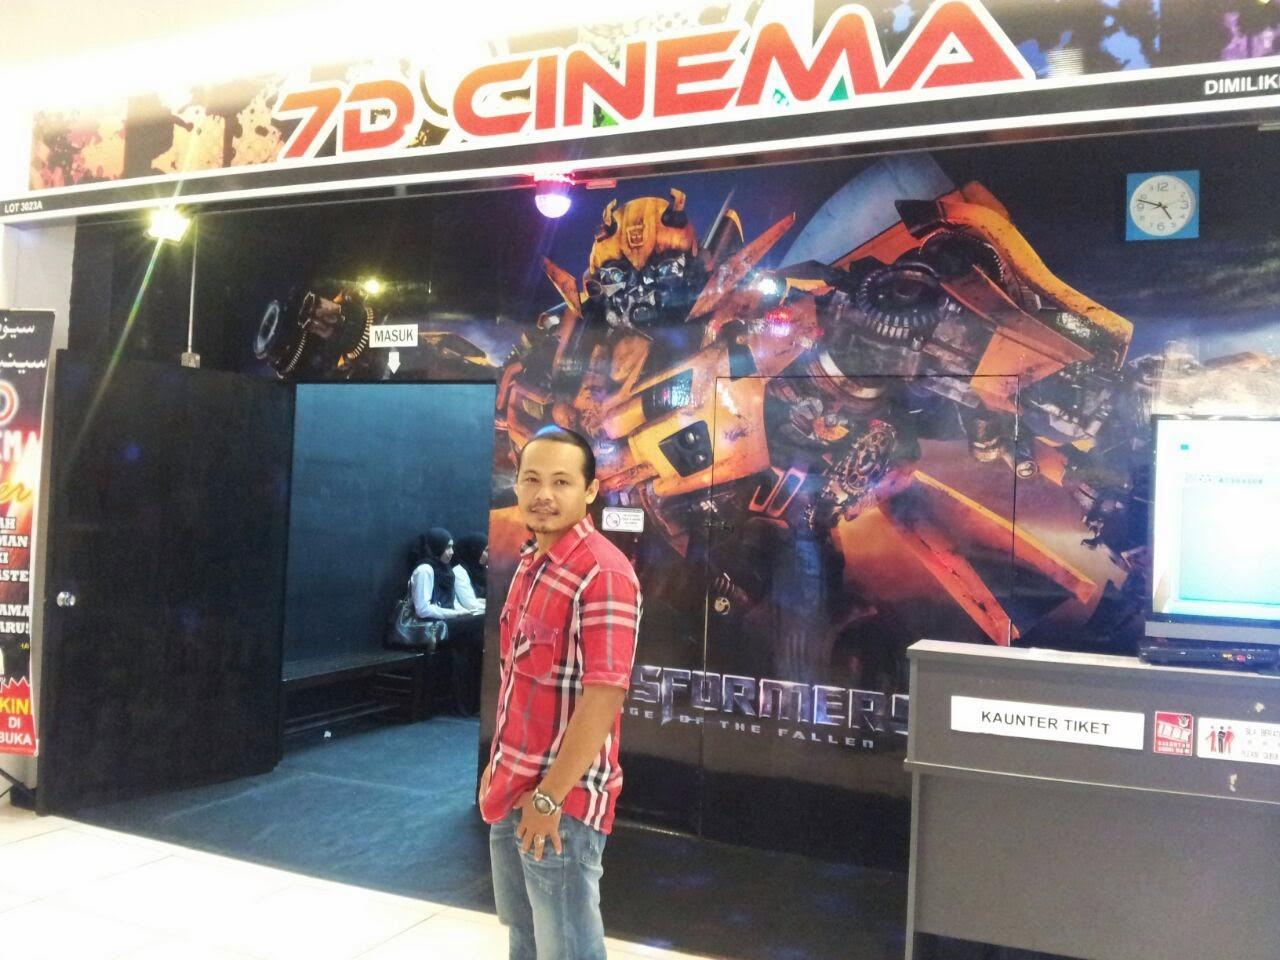 7D Cinema di KBMALL Kelantan, 7D CINEMA, HARGA TIKET 7D CINEMA, 7D CINEMA RIDER, CINEMA RIDER, 7D, MOVIE 7D, ROLLER COASTER 7D